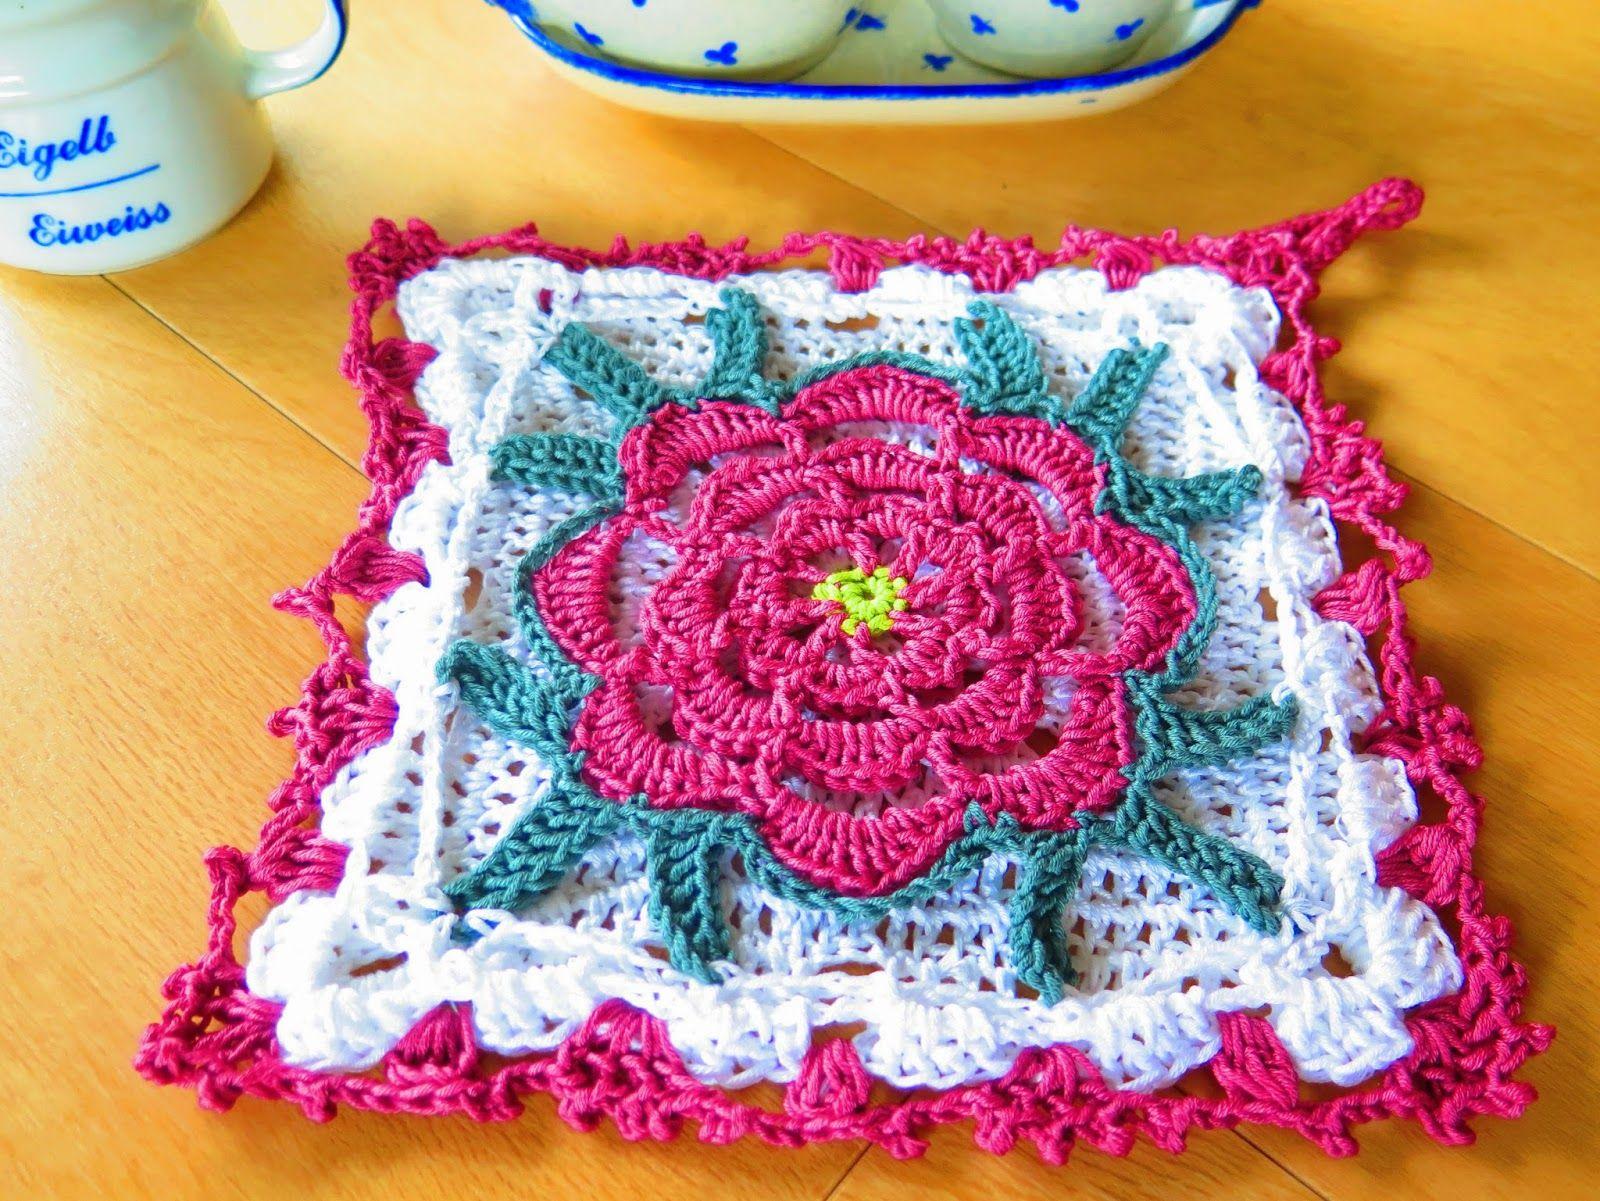 froilein lizzi h kelt vintage topflappen wie von oma grandmas vintage potholder crochet. Black Bedroom Furniture Sets. Home Design Ideas